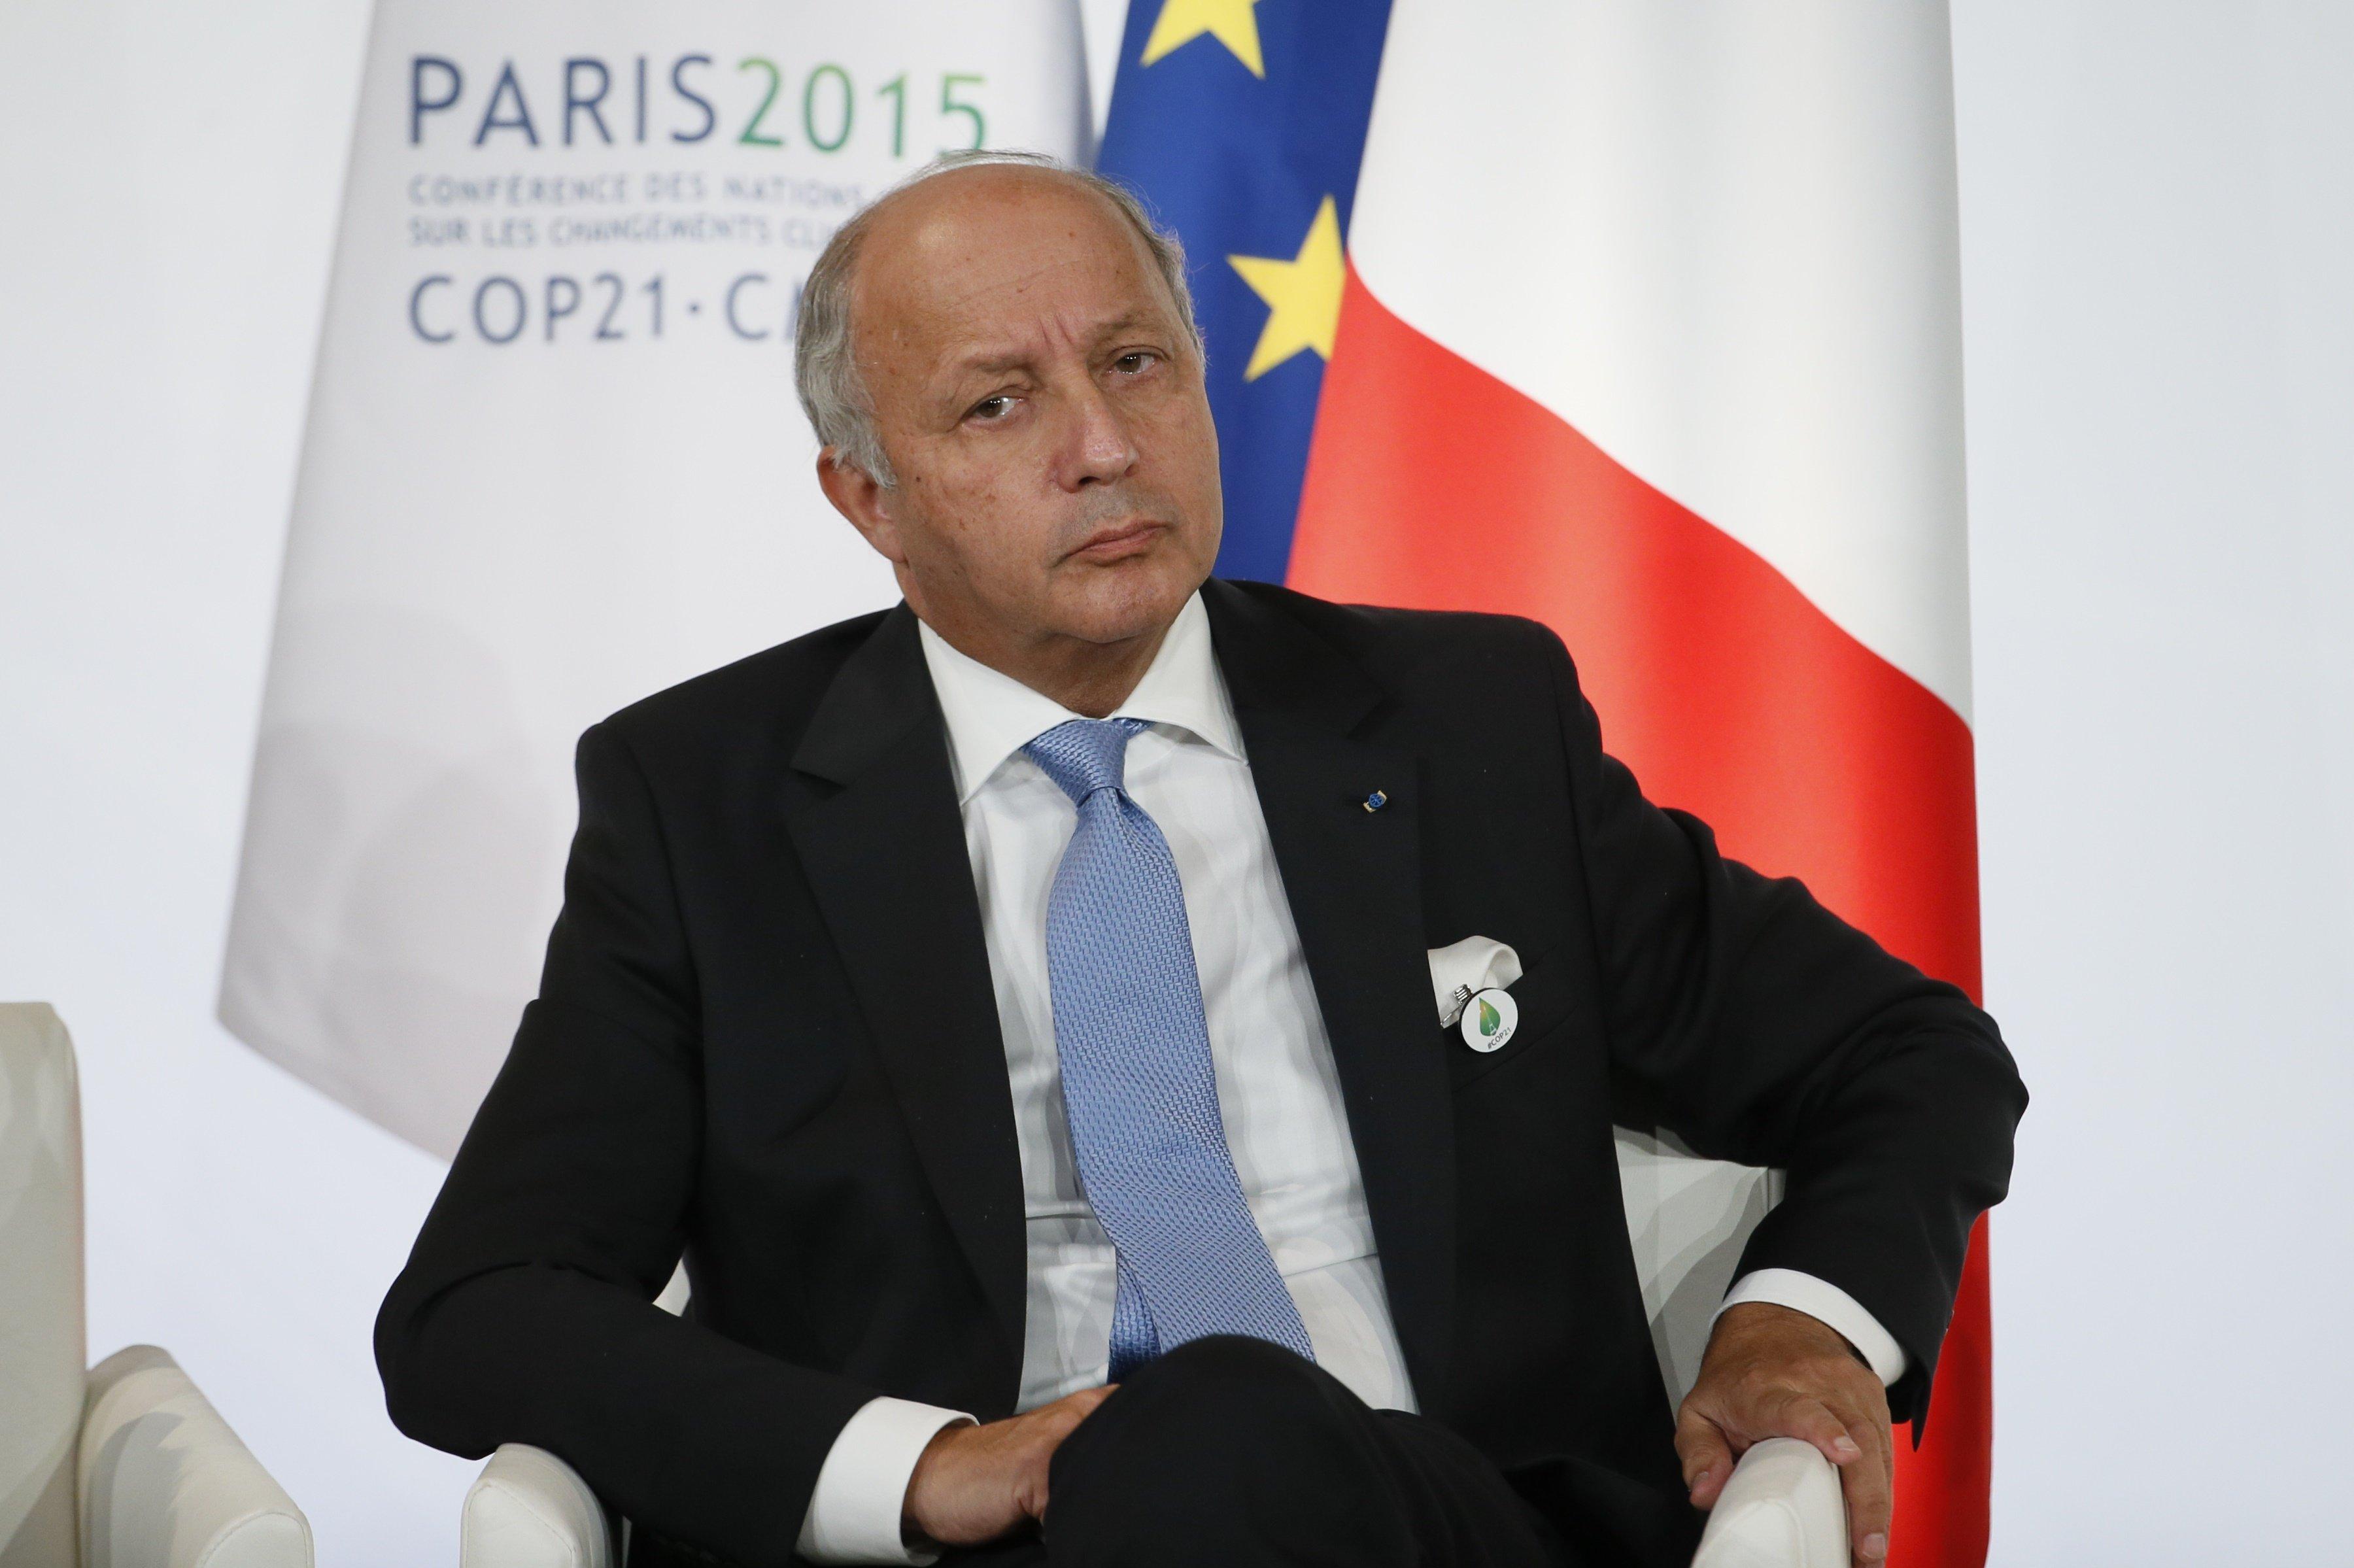 Laurent Fabius, exministro de Asuntos Exteriores de Francia